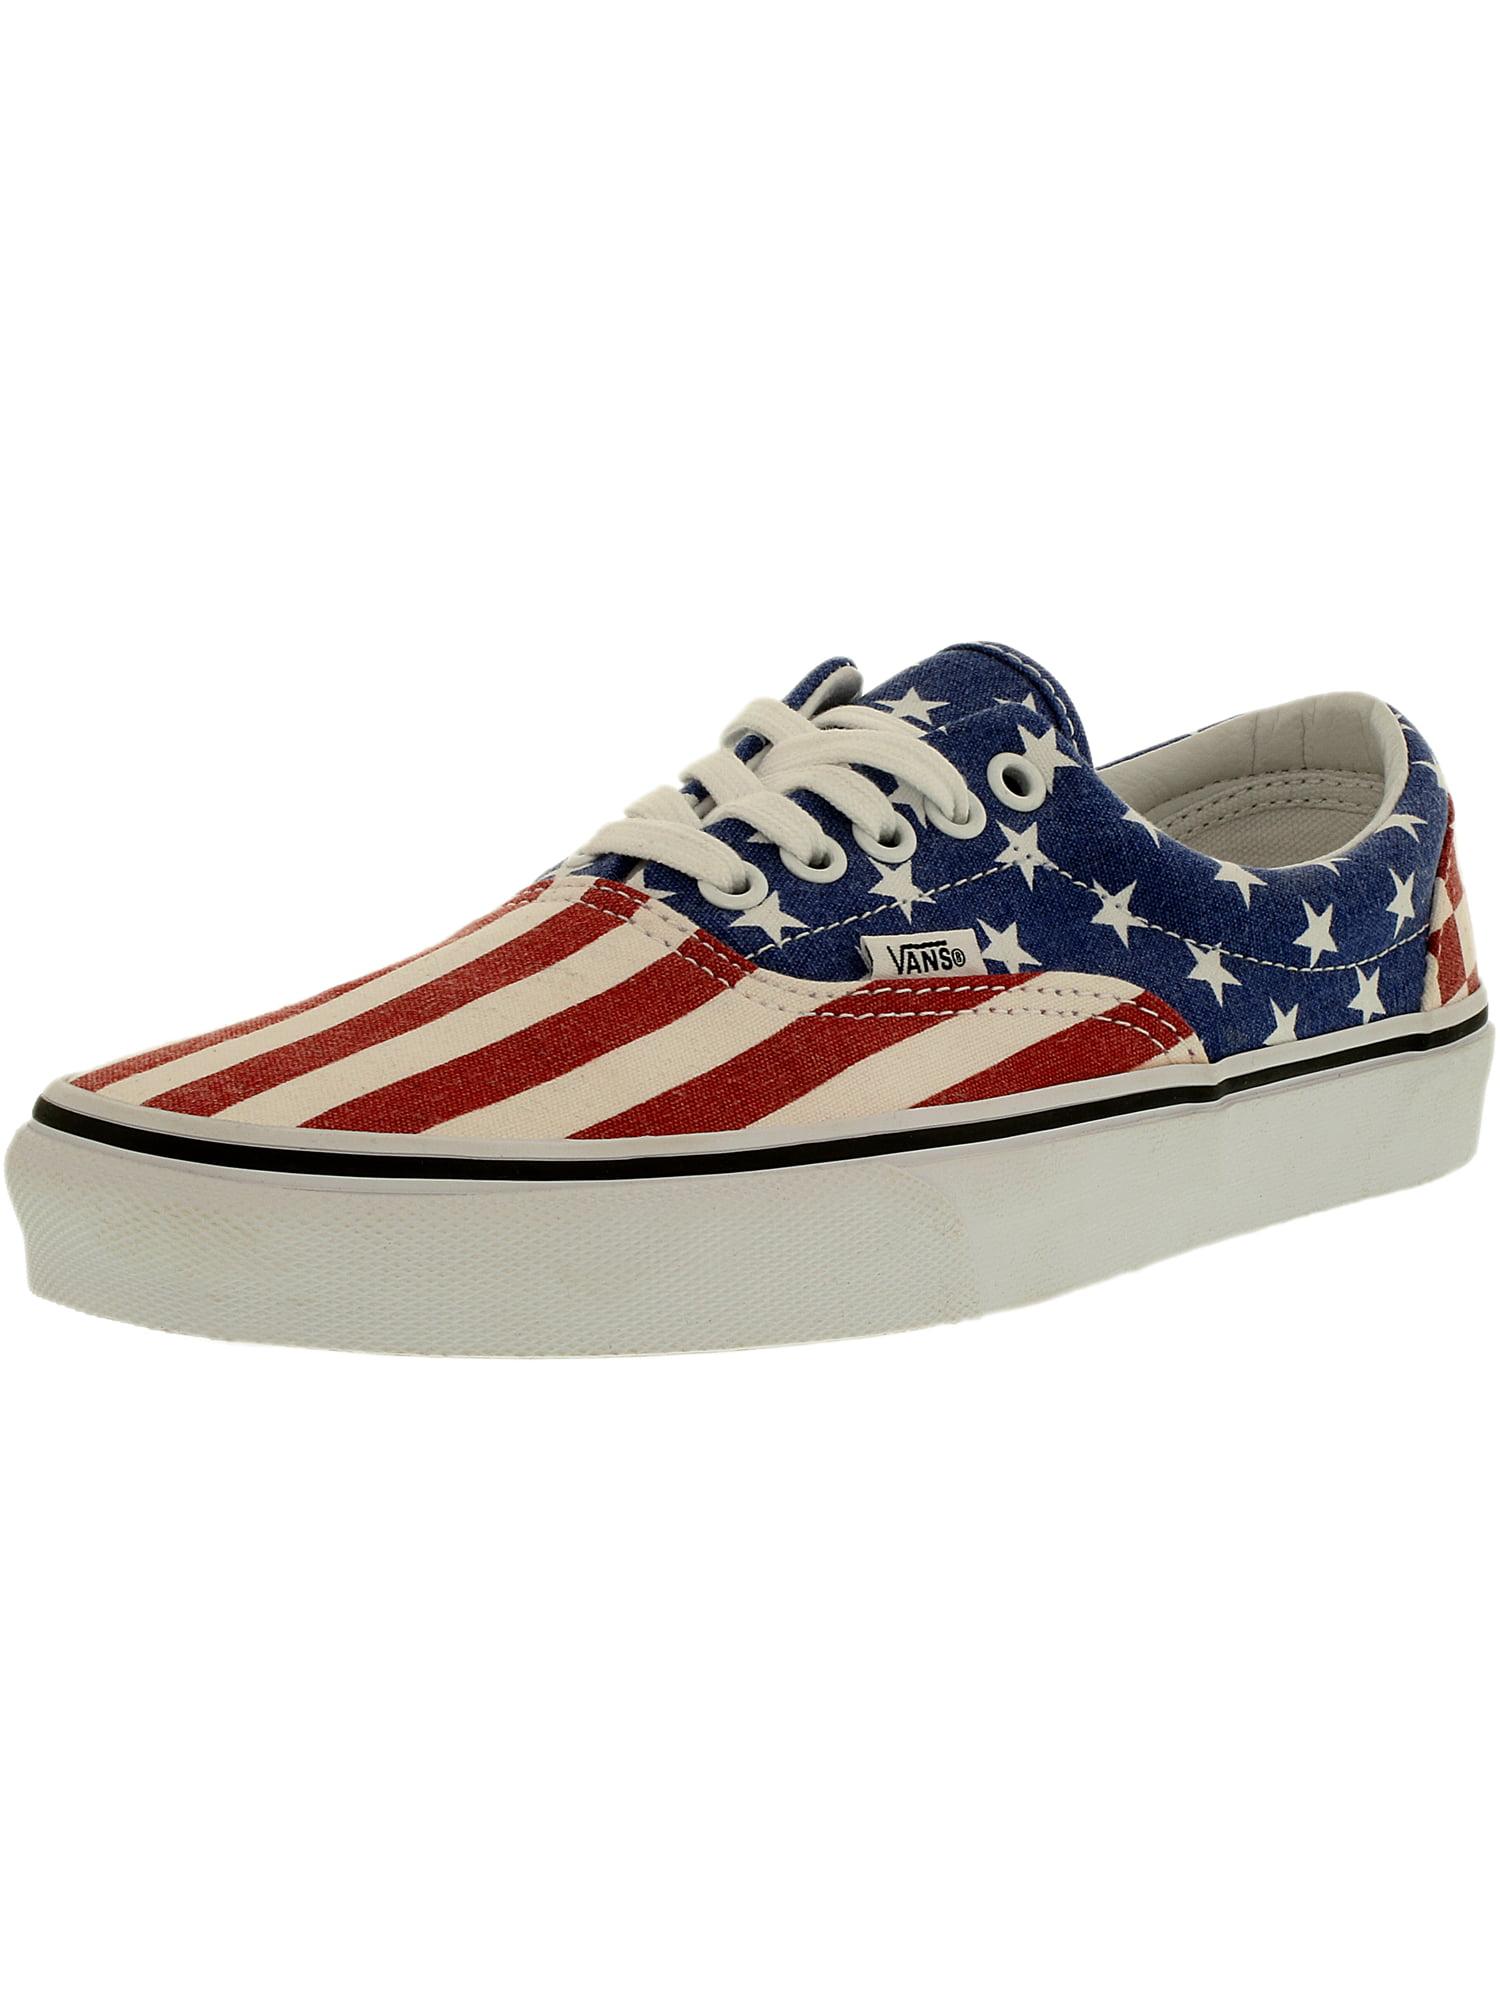 Vans Men's Era Stars/ Stripes Ankle-High Canvas Fashion Sneaker - 12M